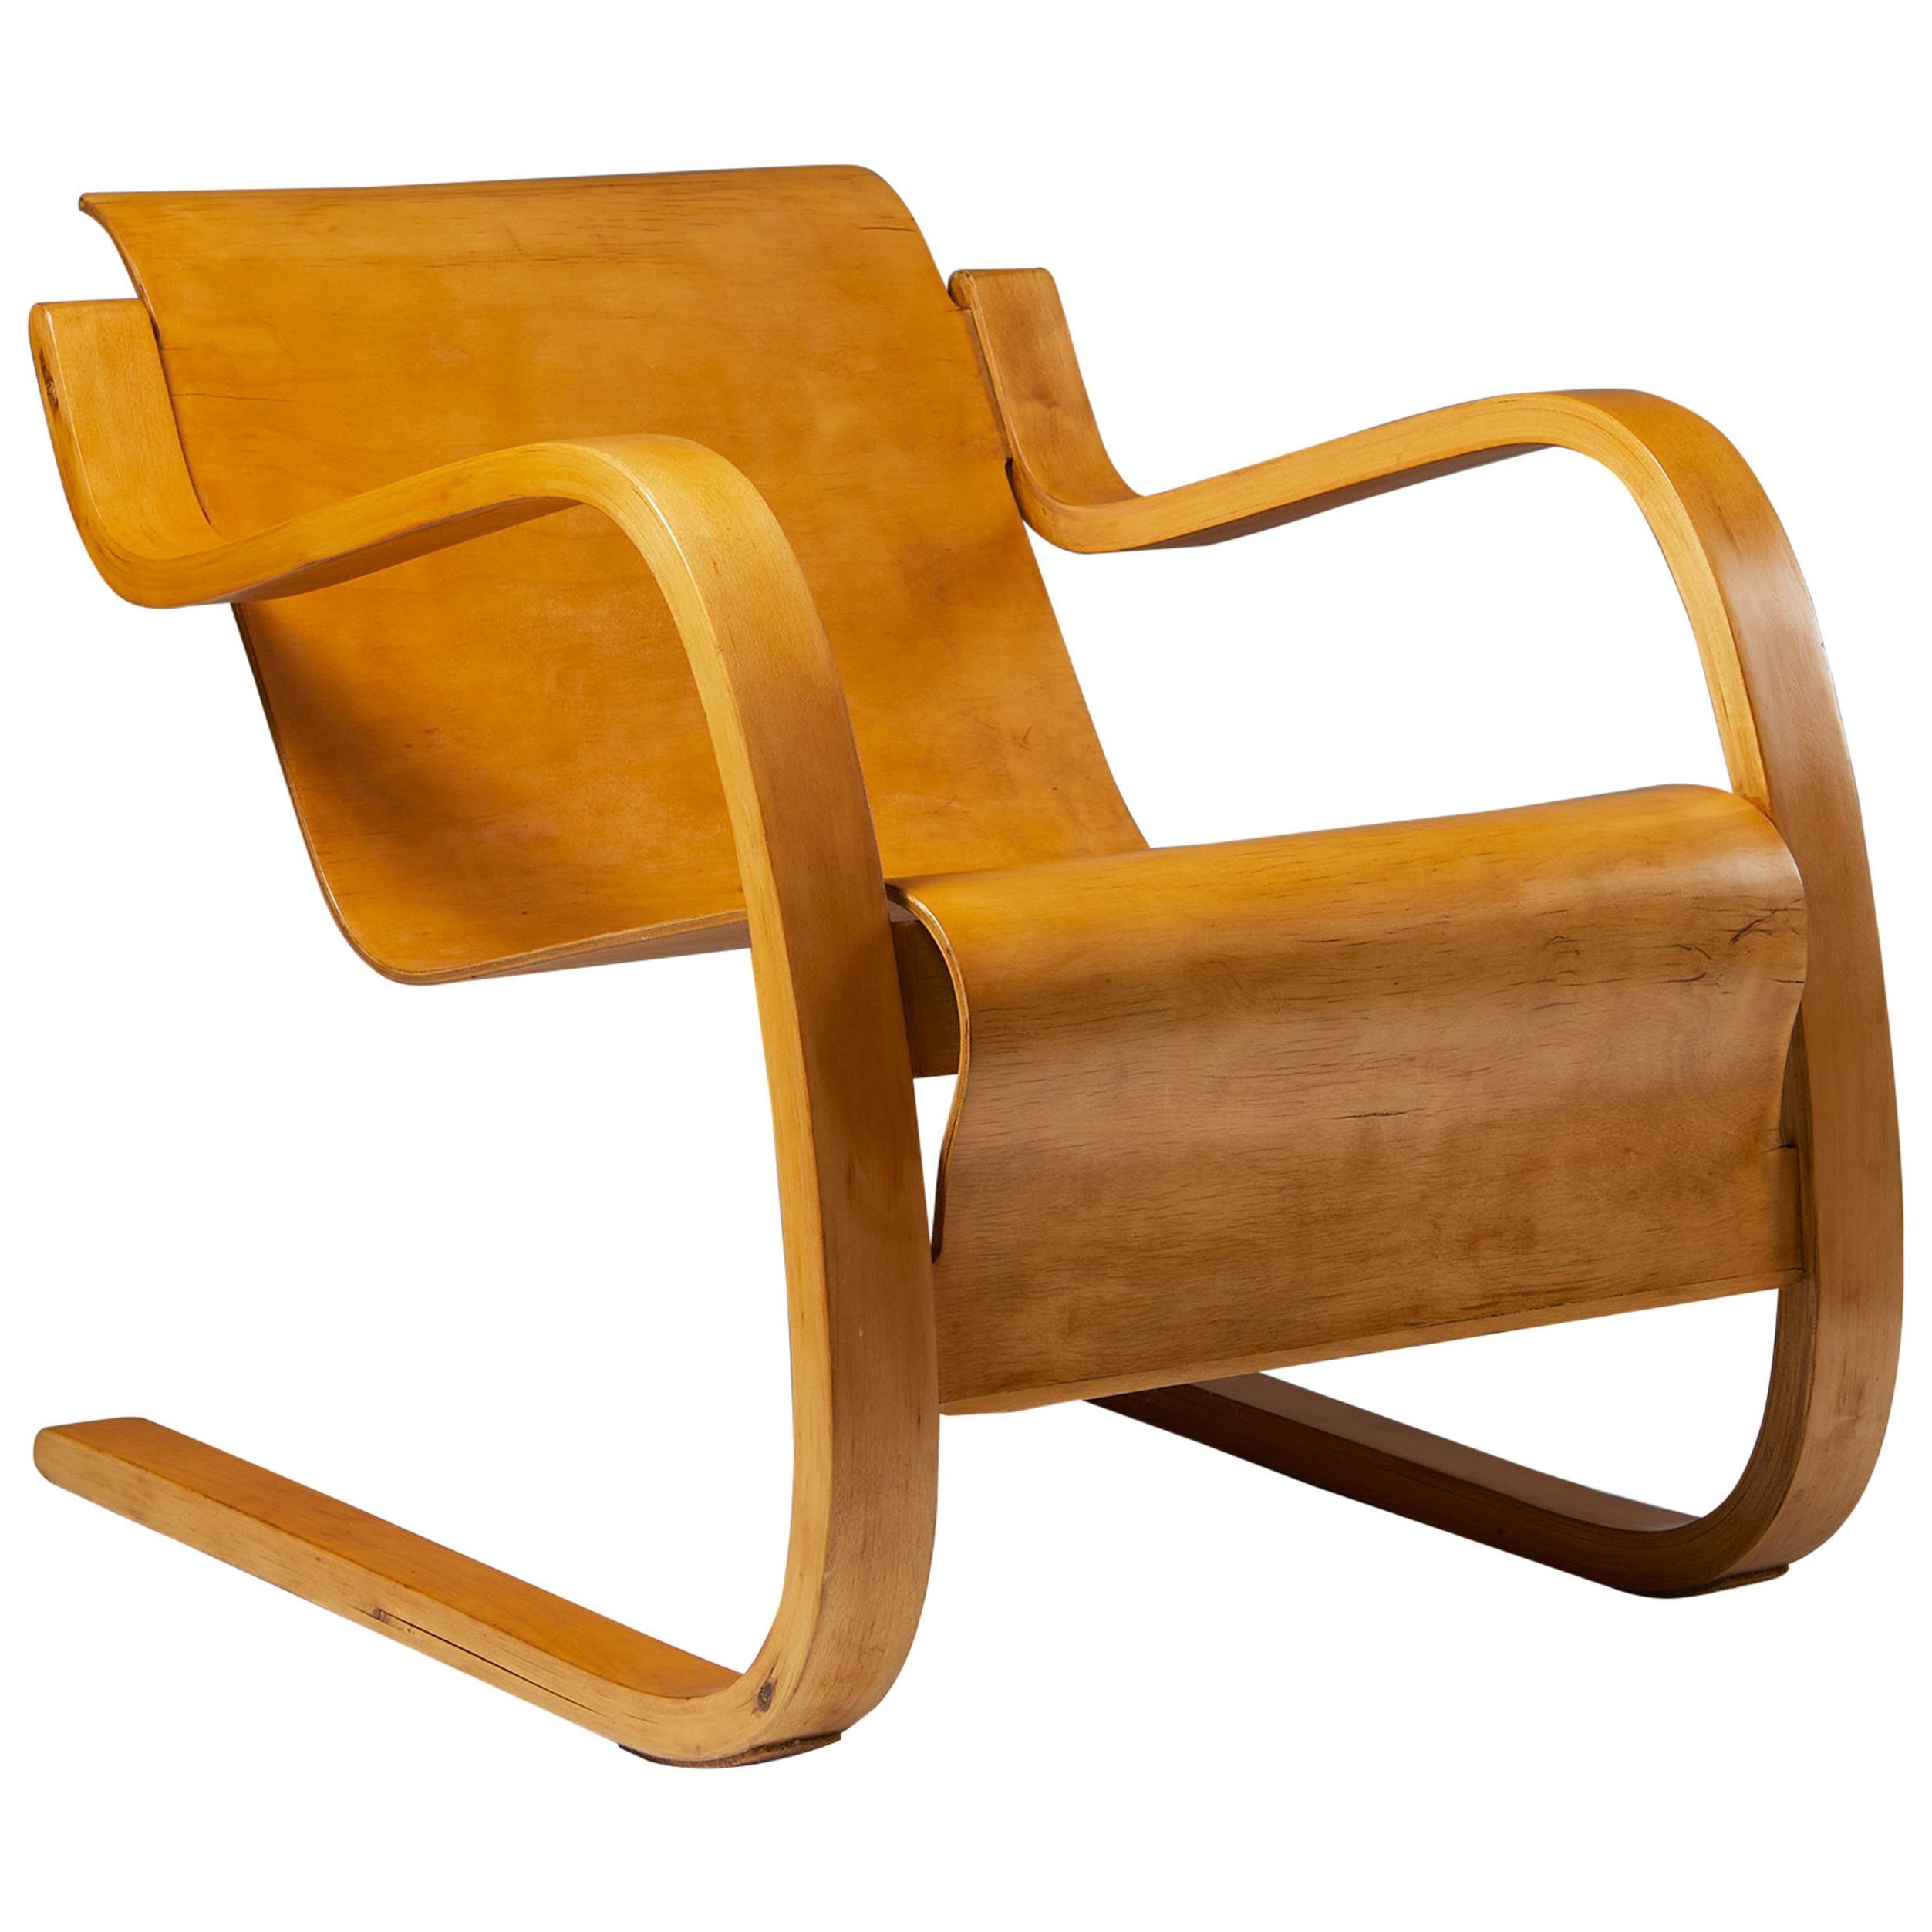 "Armchair 42 ""Little Paimio"" Designed by Alvar Aalto, Finland, 1931"